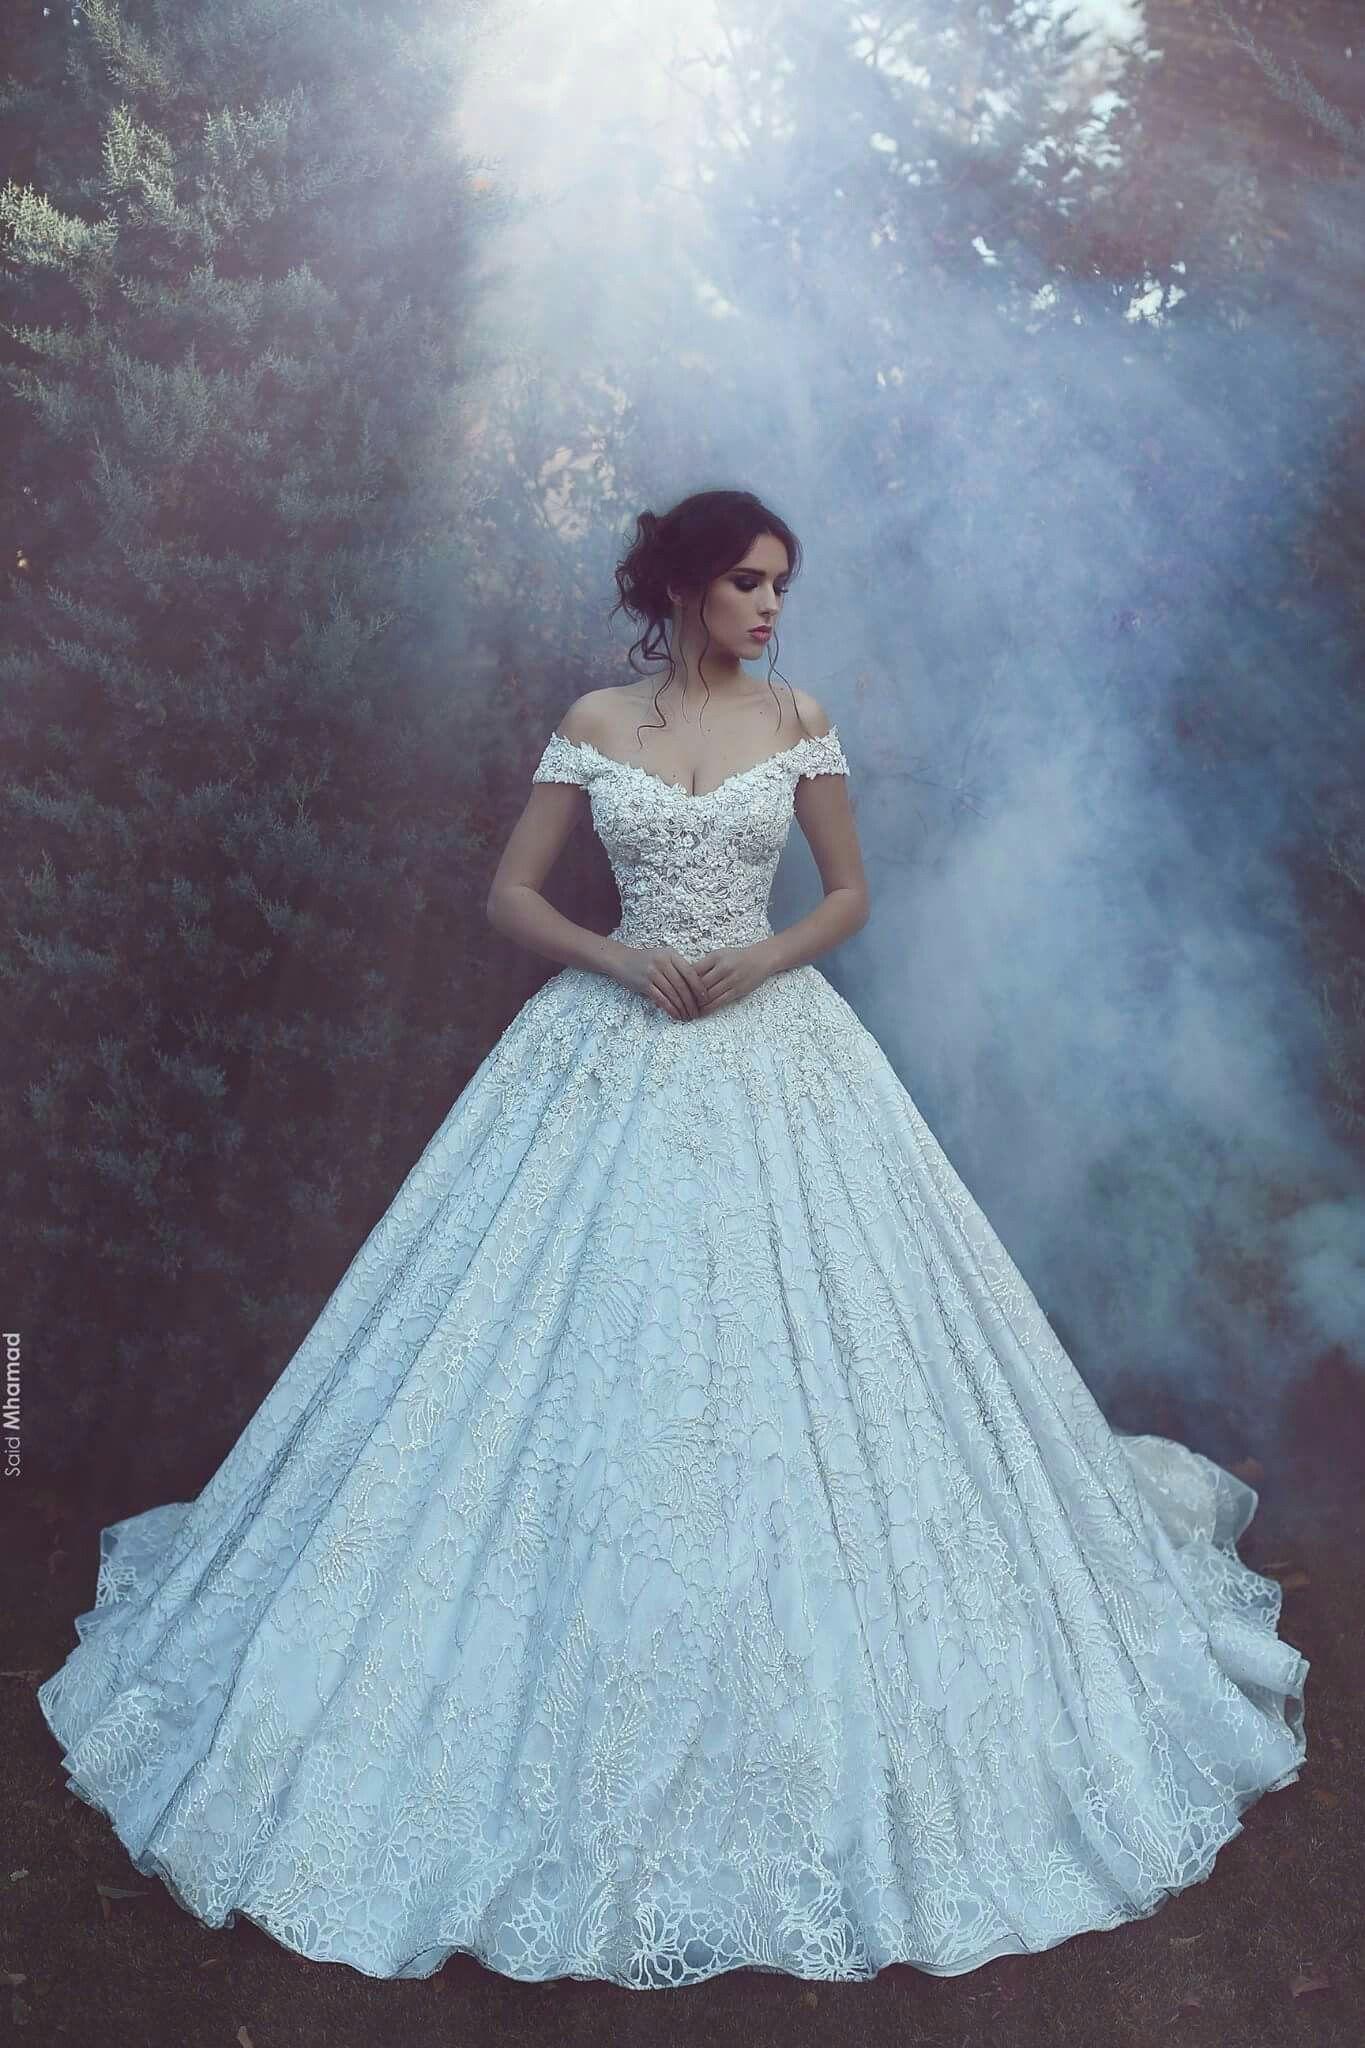 Pin by DYA FSHIONER 👑 on Wedding dresses ⚪⚪⚪ | Pinterest ...